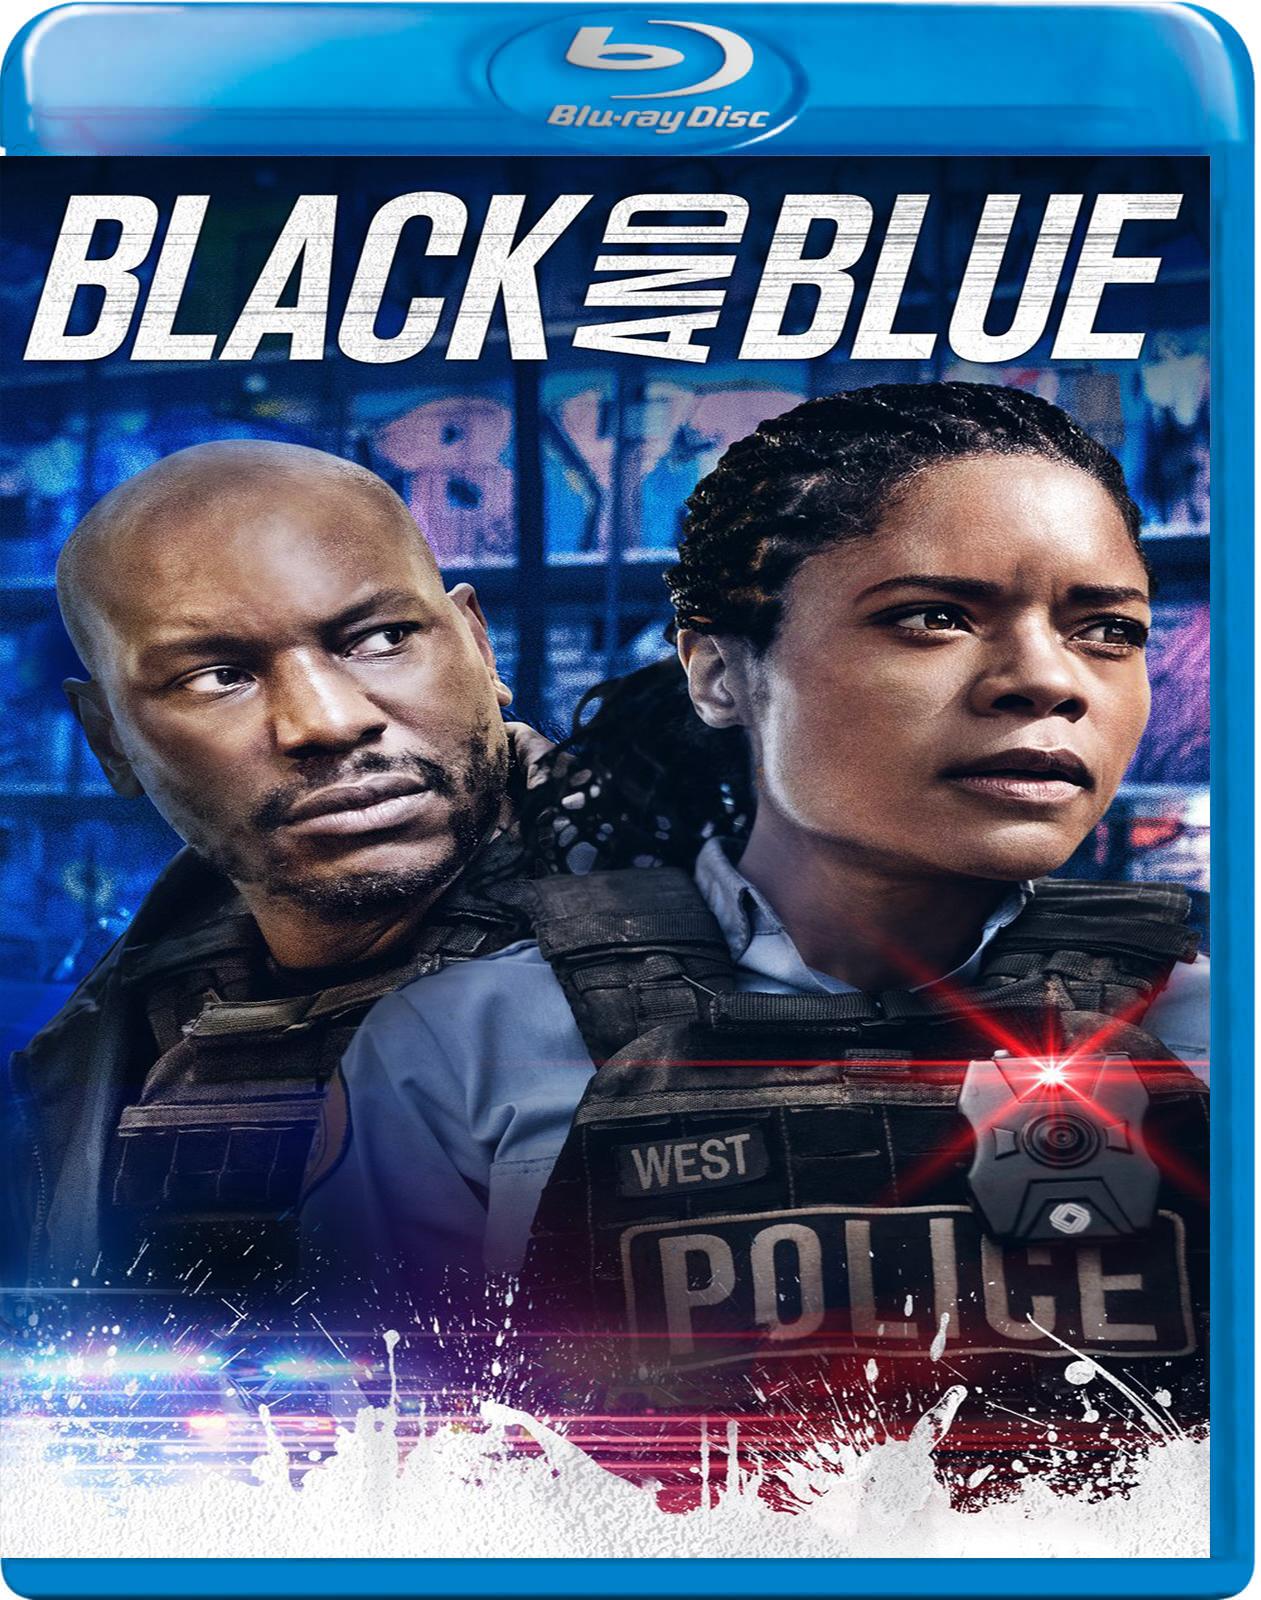 Black and Blue [2019] [BD50] [Latino]